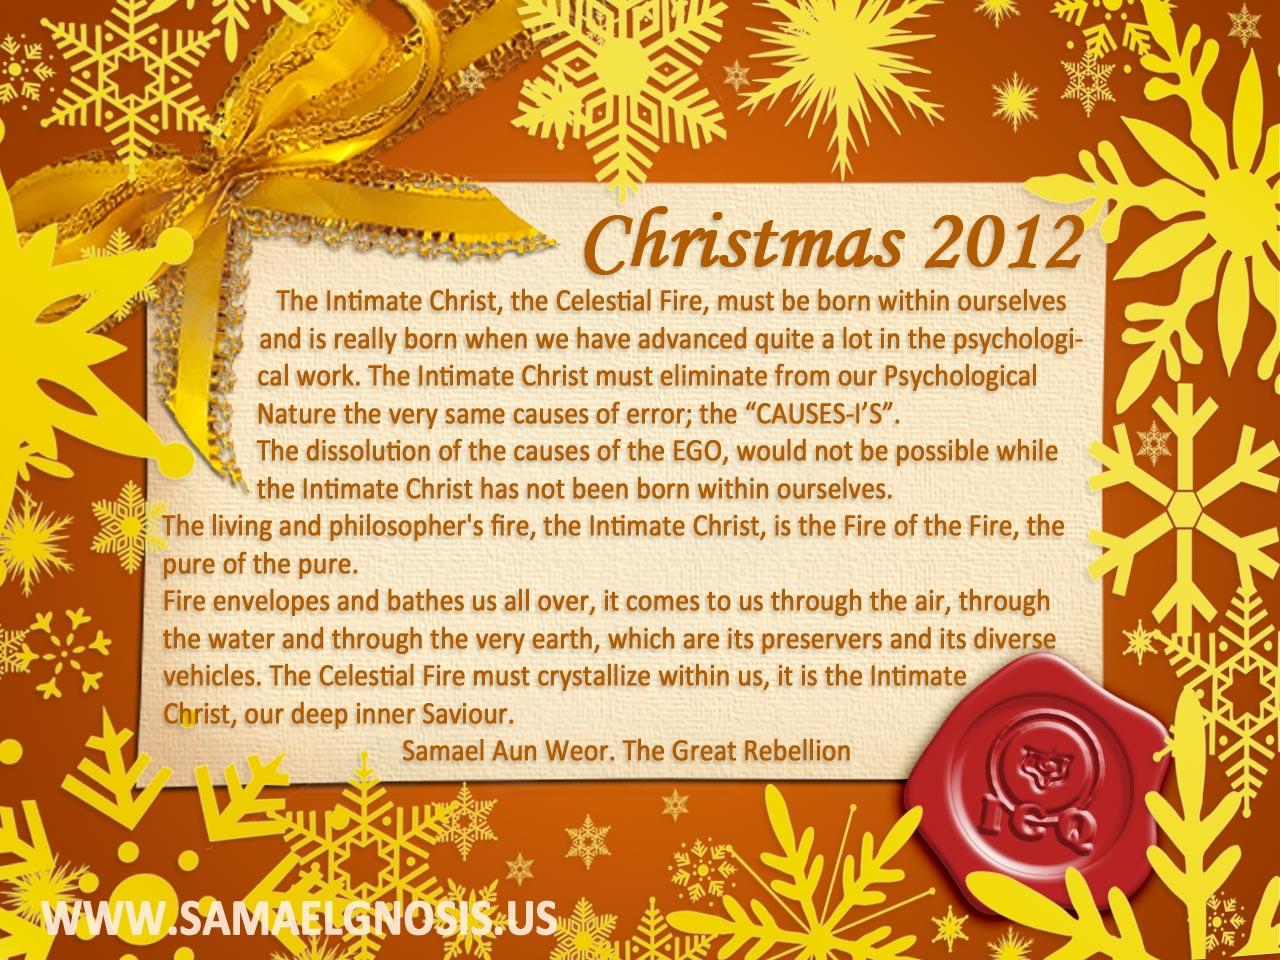 Christmas card samaelgnosis instituto cultural quetzalcoatl 2012 kristyandbryce Gallery